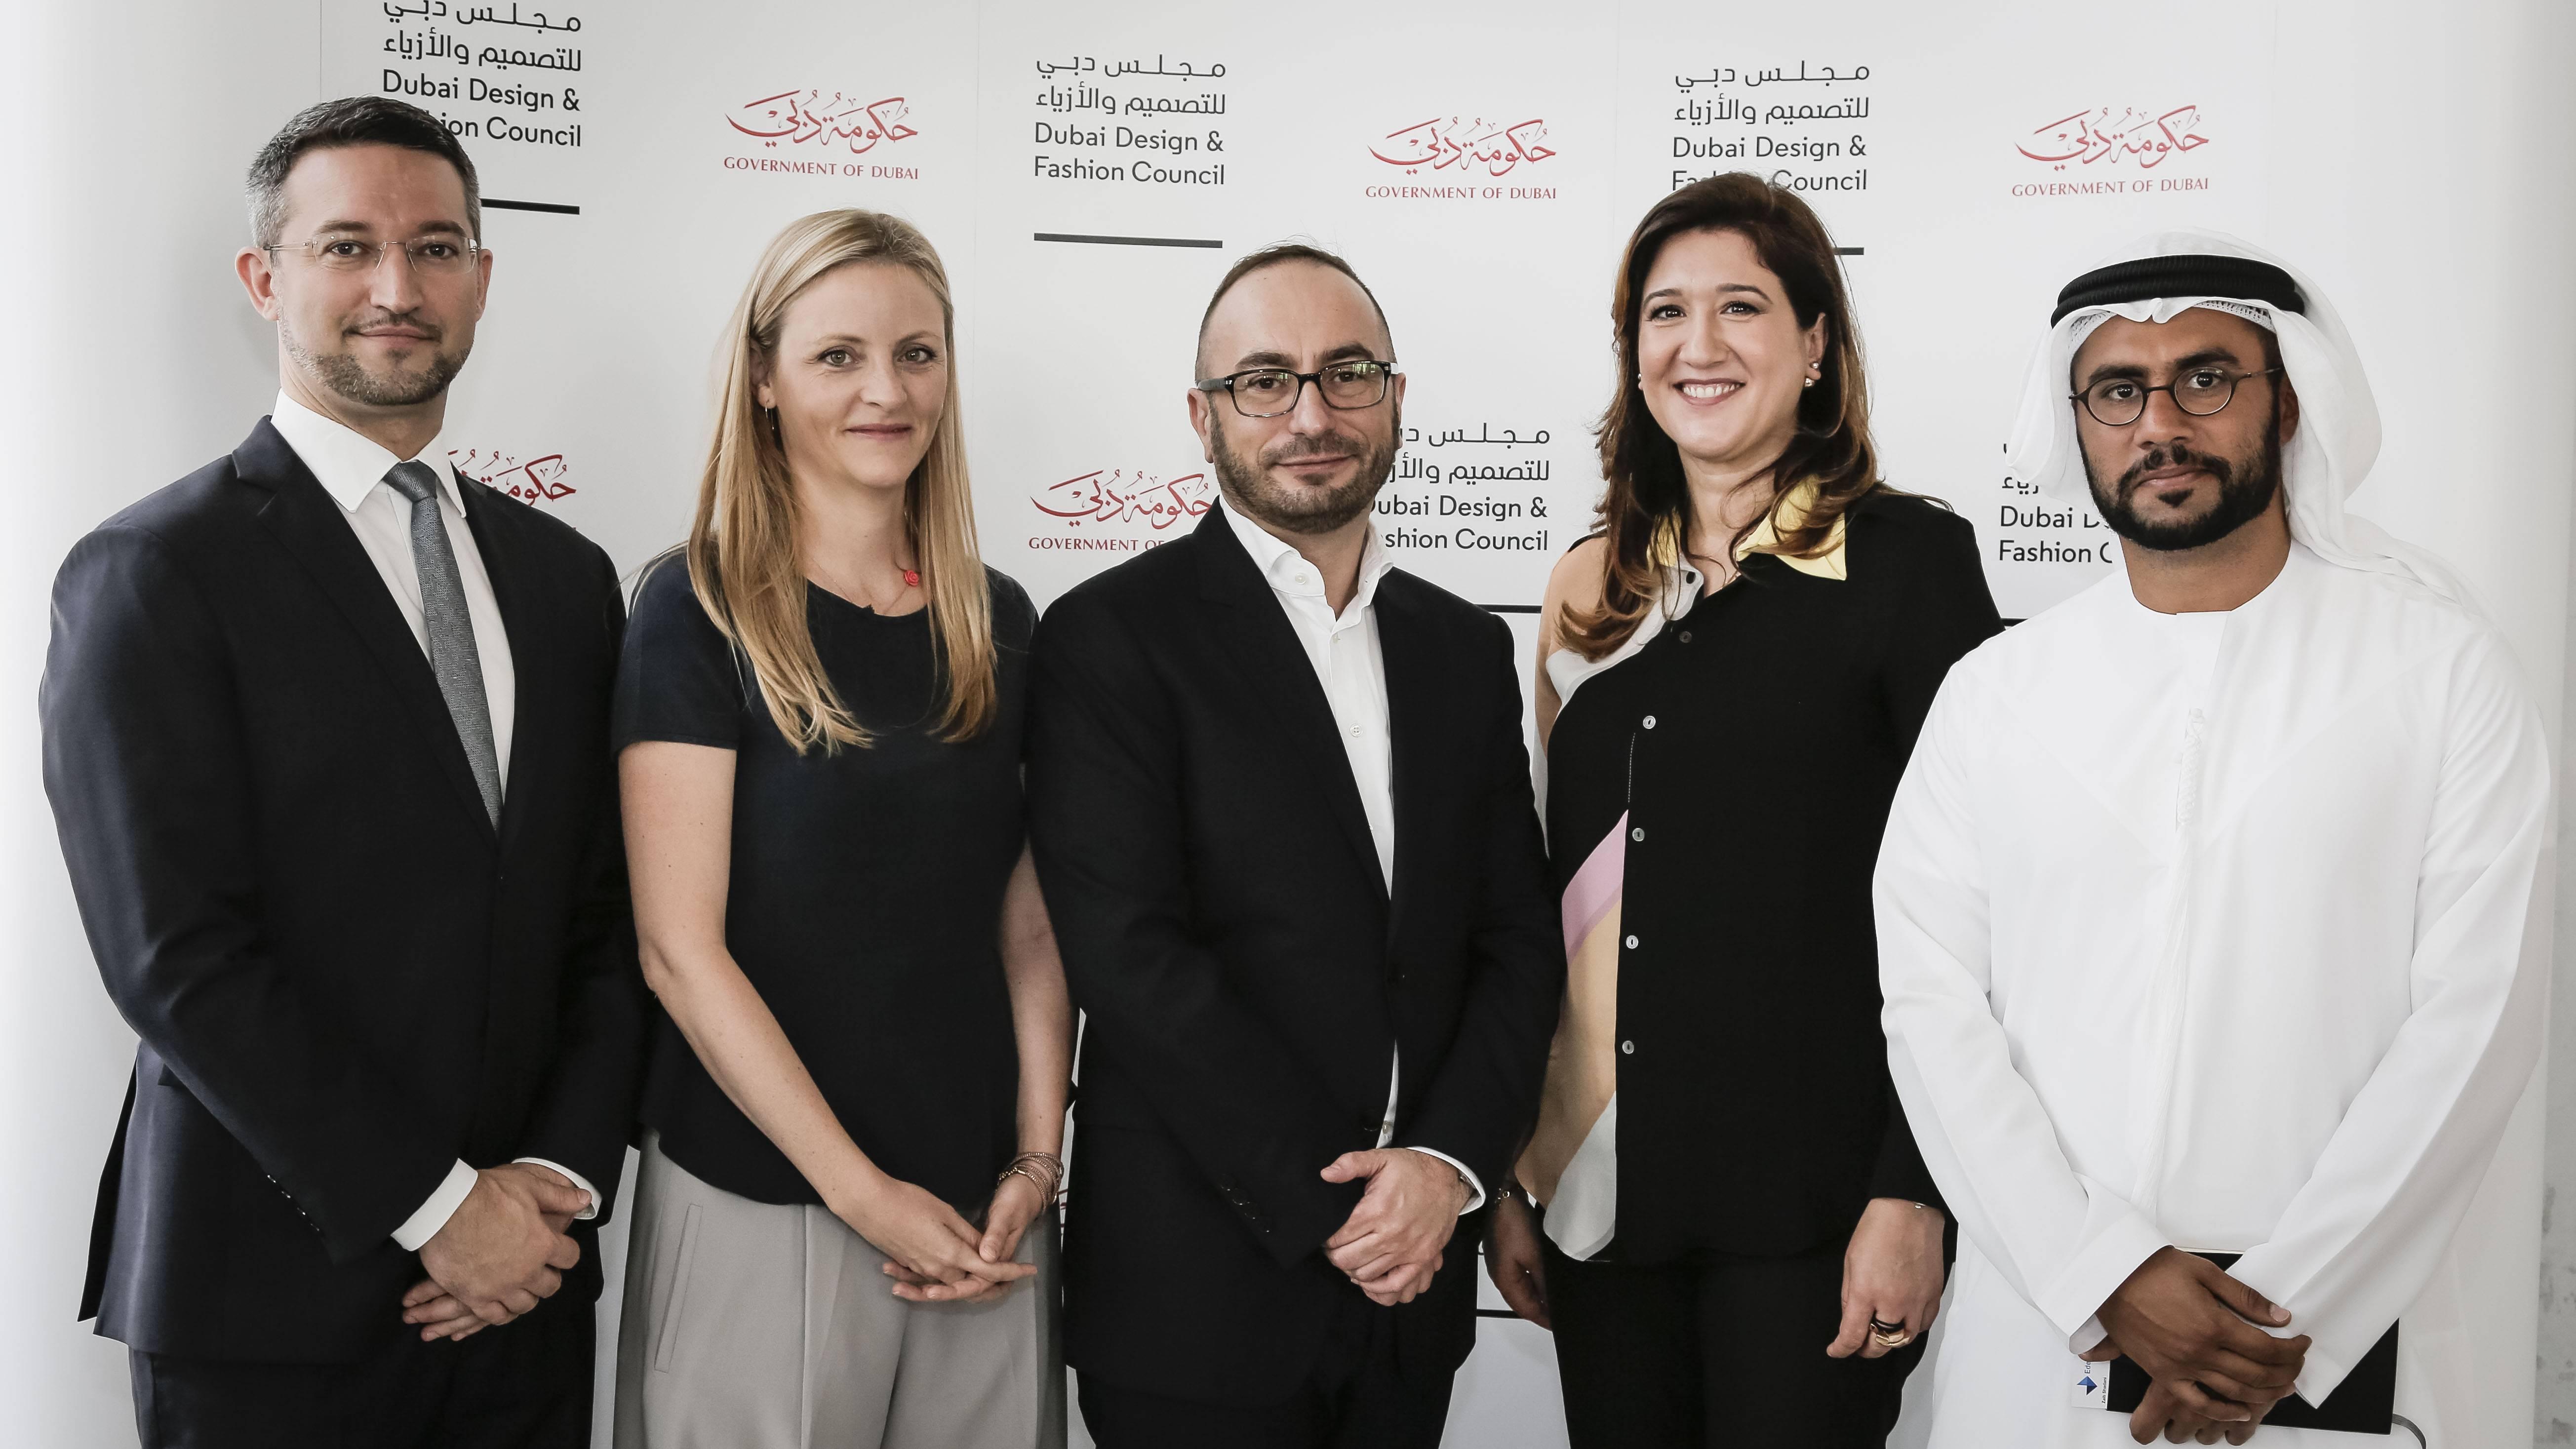 Dubai Design And Fashion Council Announces Dubai Design Week